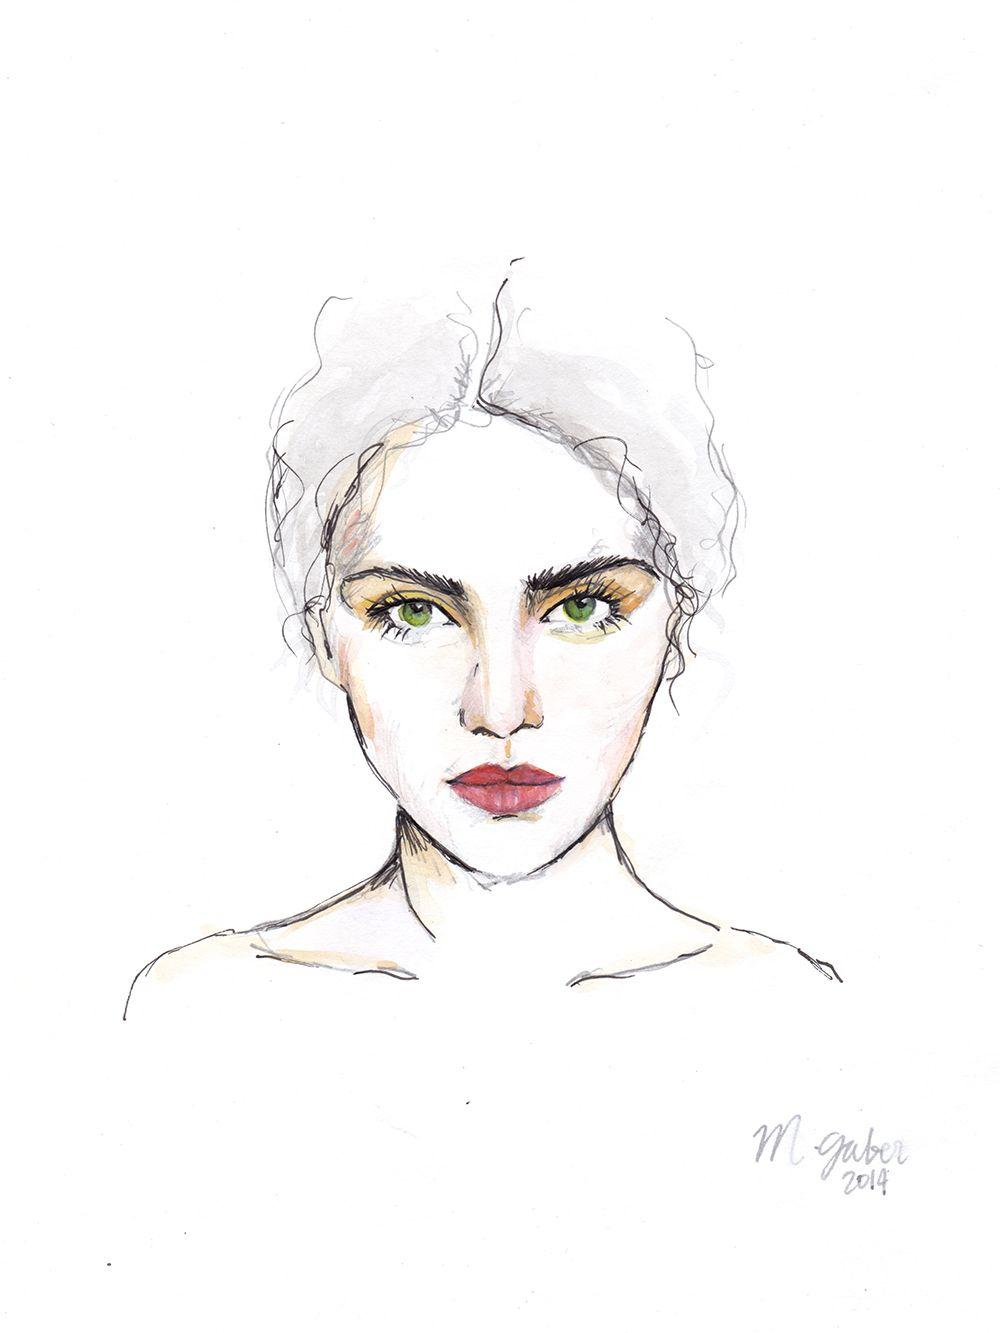 Watercolor Fashion Illustration Sketch Face Drawing Fa Fashion Illustration Sketches Face Watercolor Fashion Illustration Sketches Fashion Illustration Face